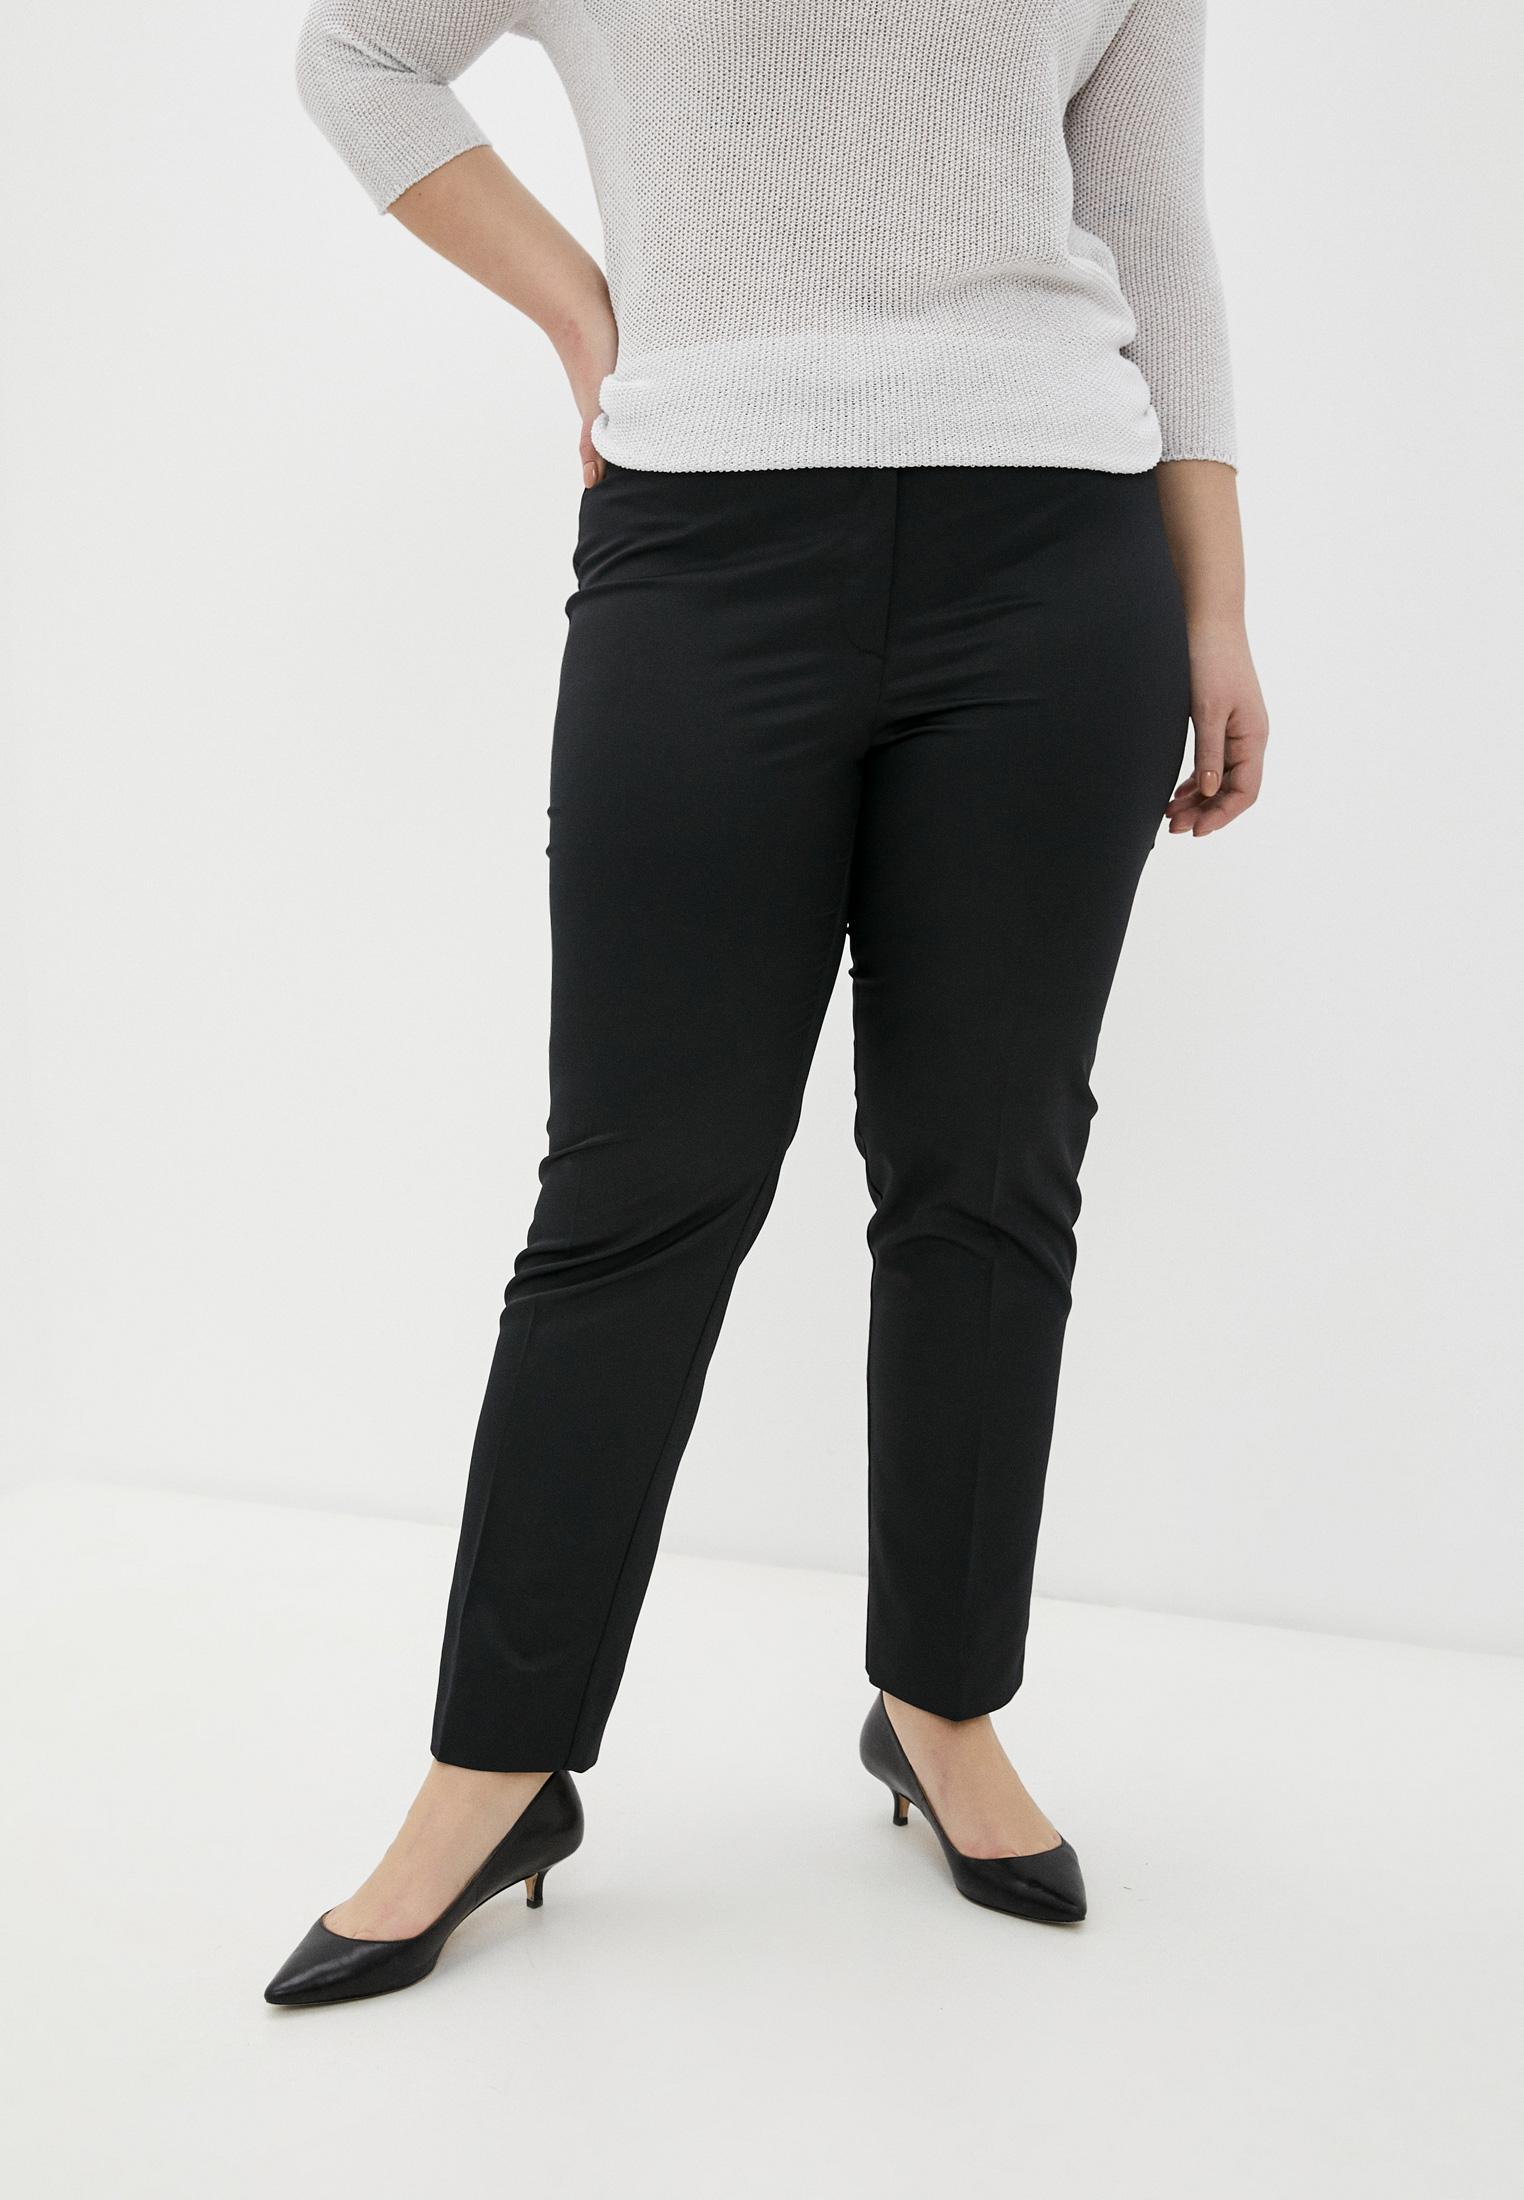 Женские классические брюки Persona by Marina Rinaldi 1131301: изображение 1